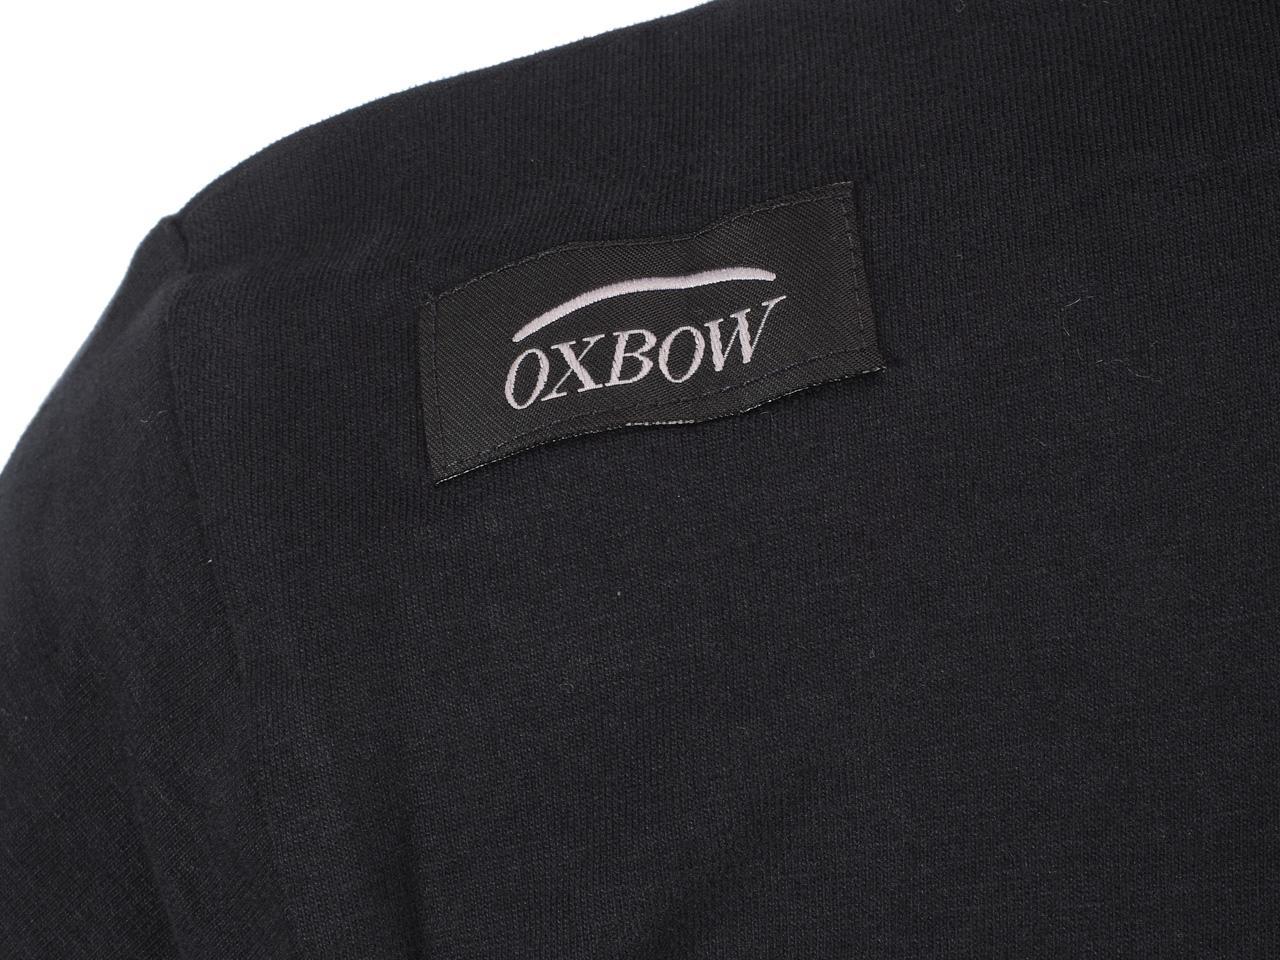 Polo-manches-longues-Oxbow-Smu-noir-ml-polo-Noir-23824-Neuf